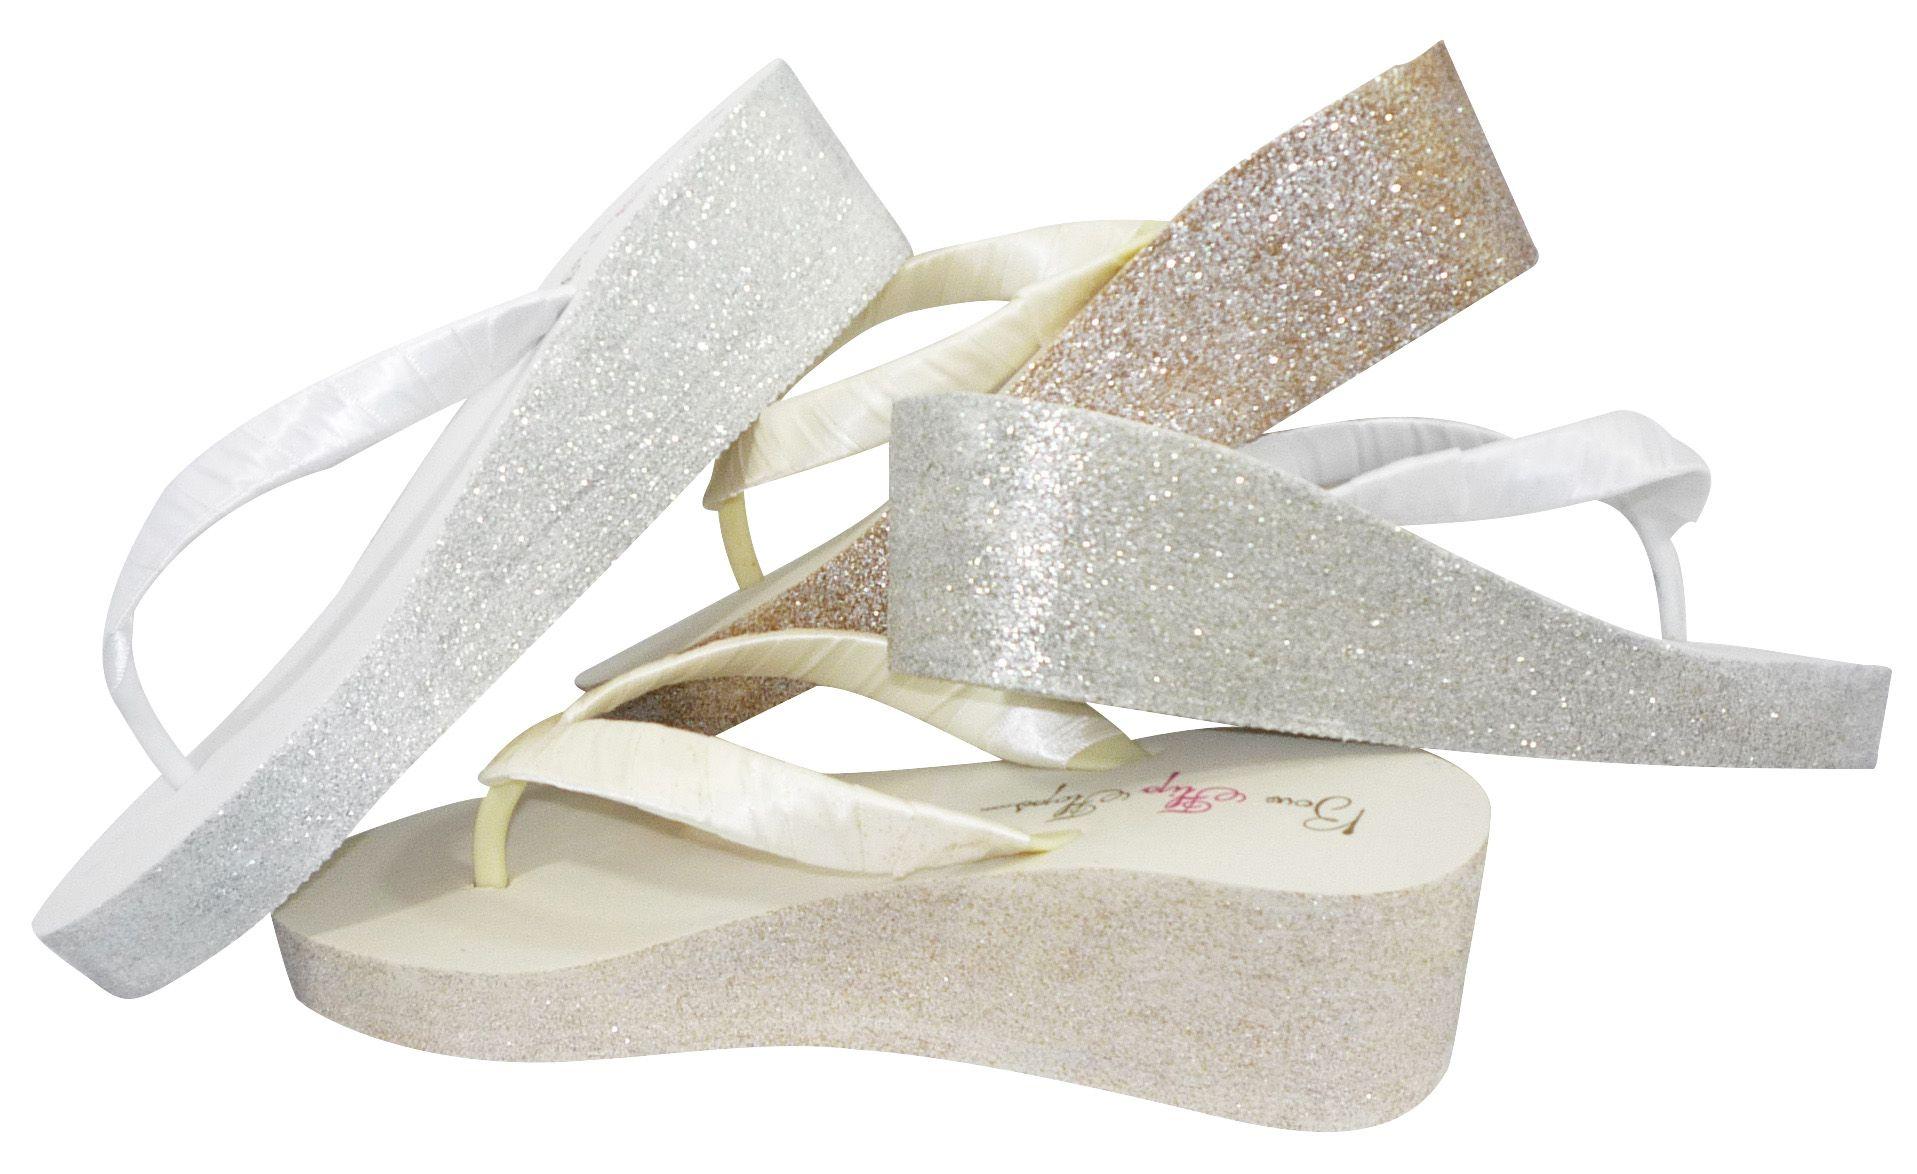 70c1cc40451 Glitter Bridal Flip Flops for the Wedding from bowflipflops.com ...